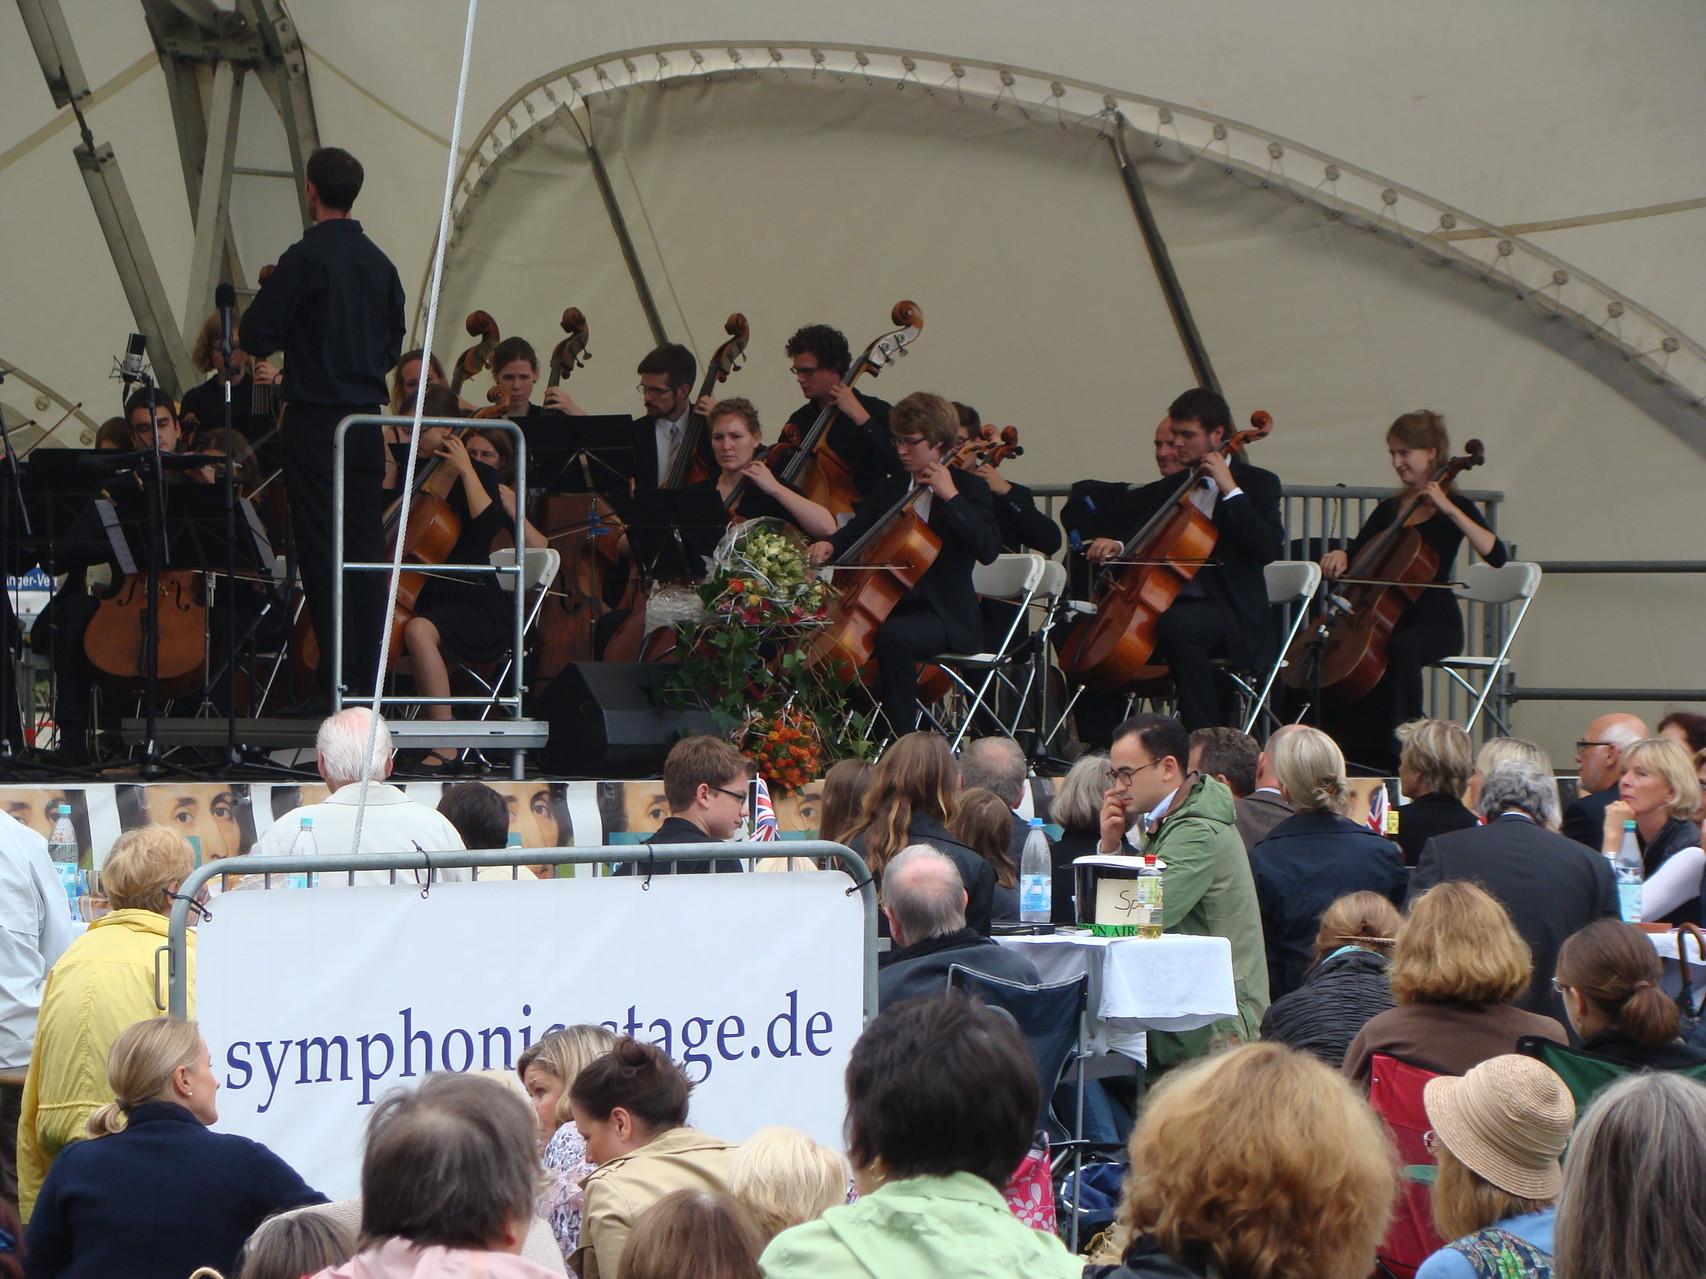 Orchester Open Air, Klassik Open Air, Open Air Bühne mieten